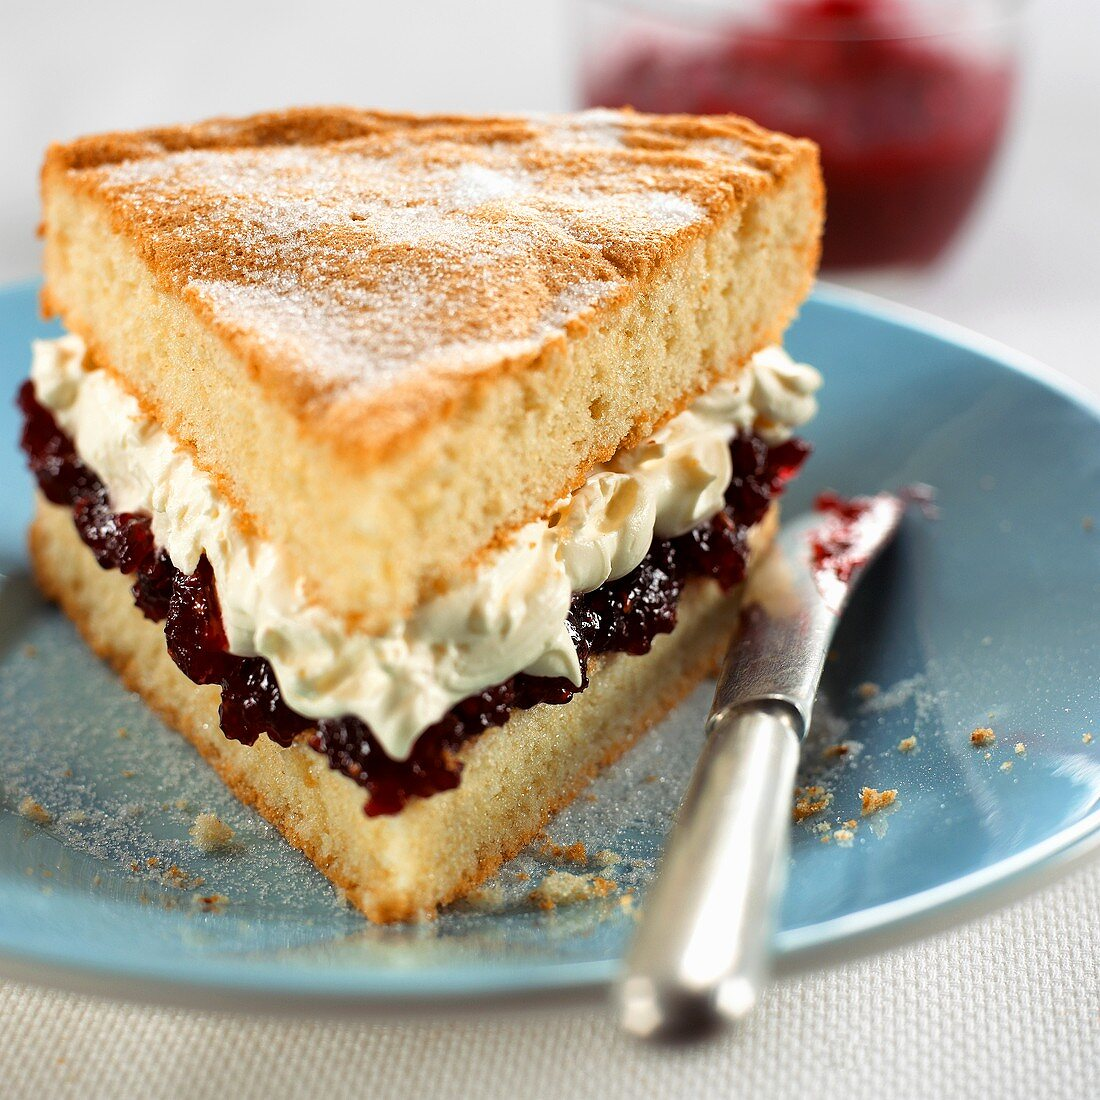 A piece of Victoria sponge (English sponge cake)